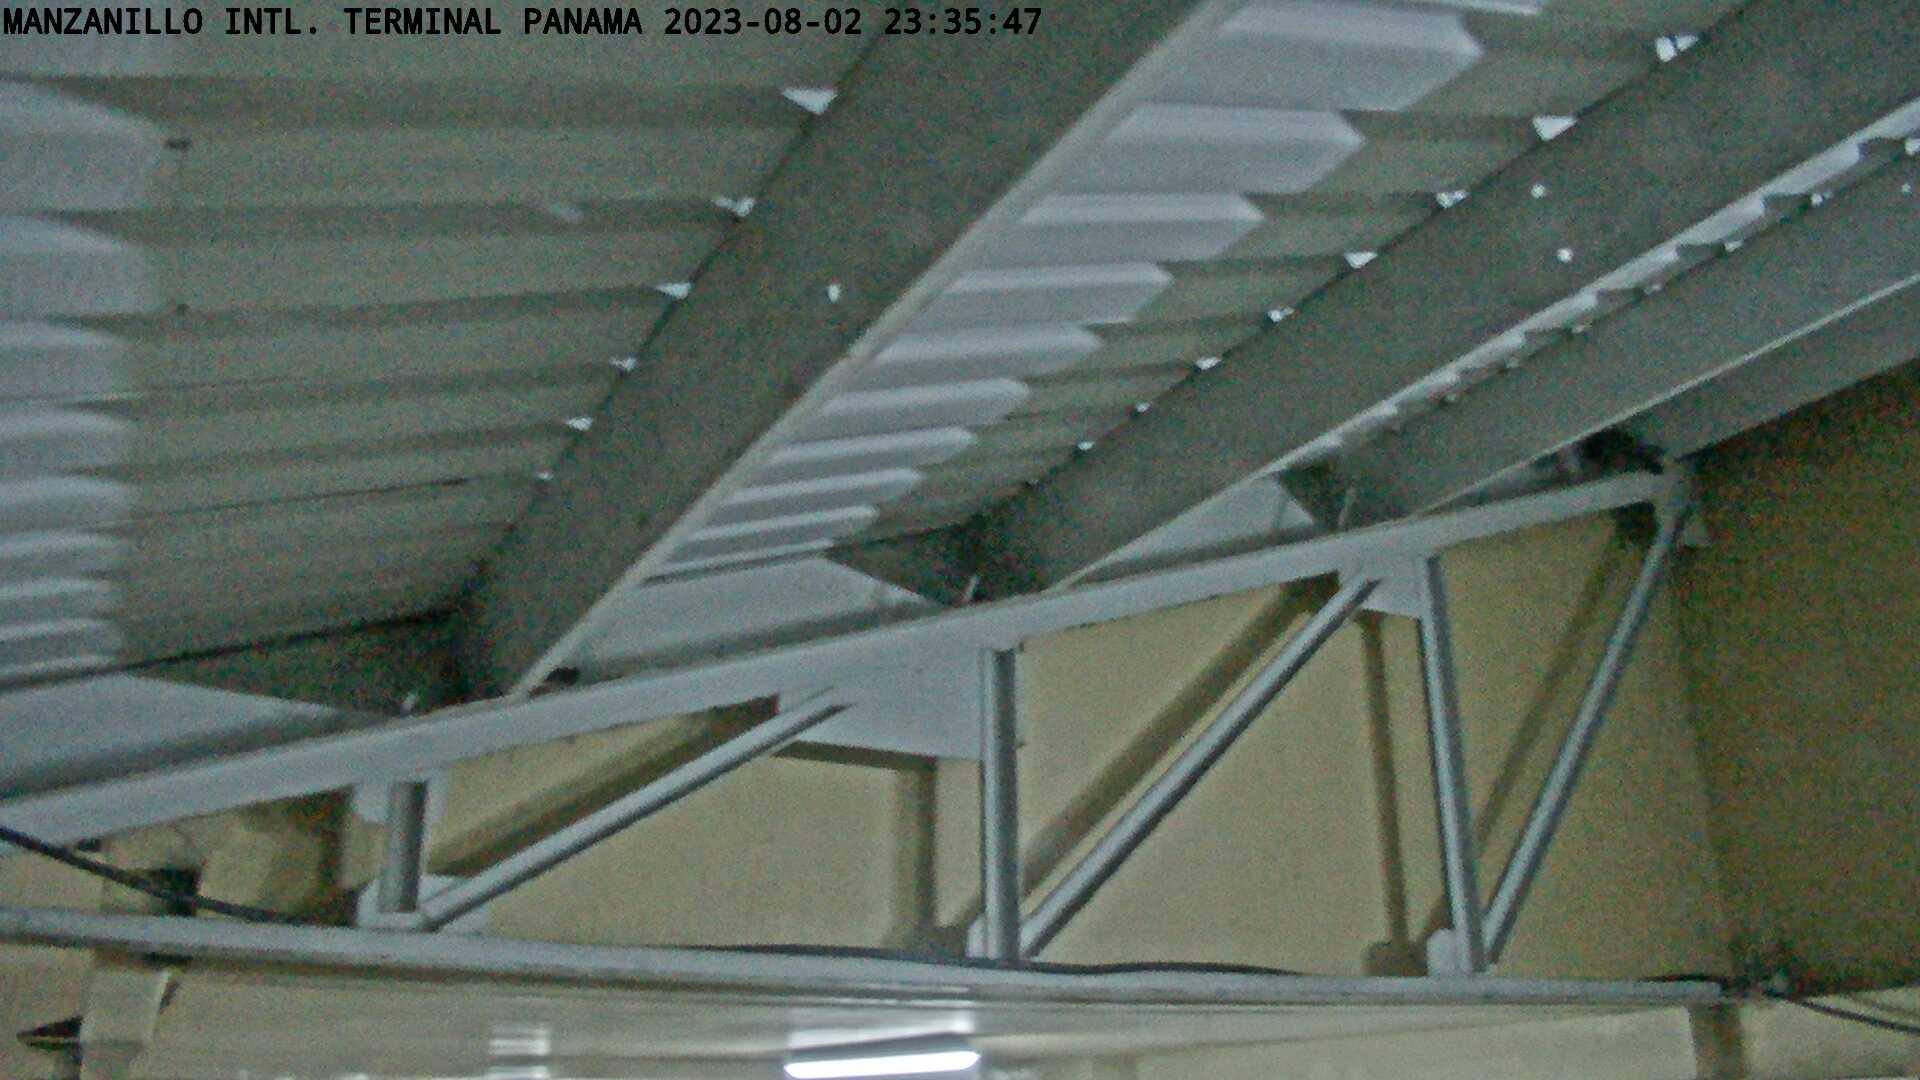 Webcam in Panama